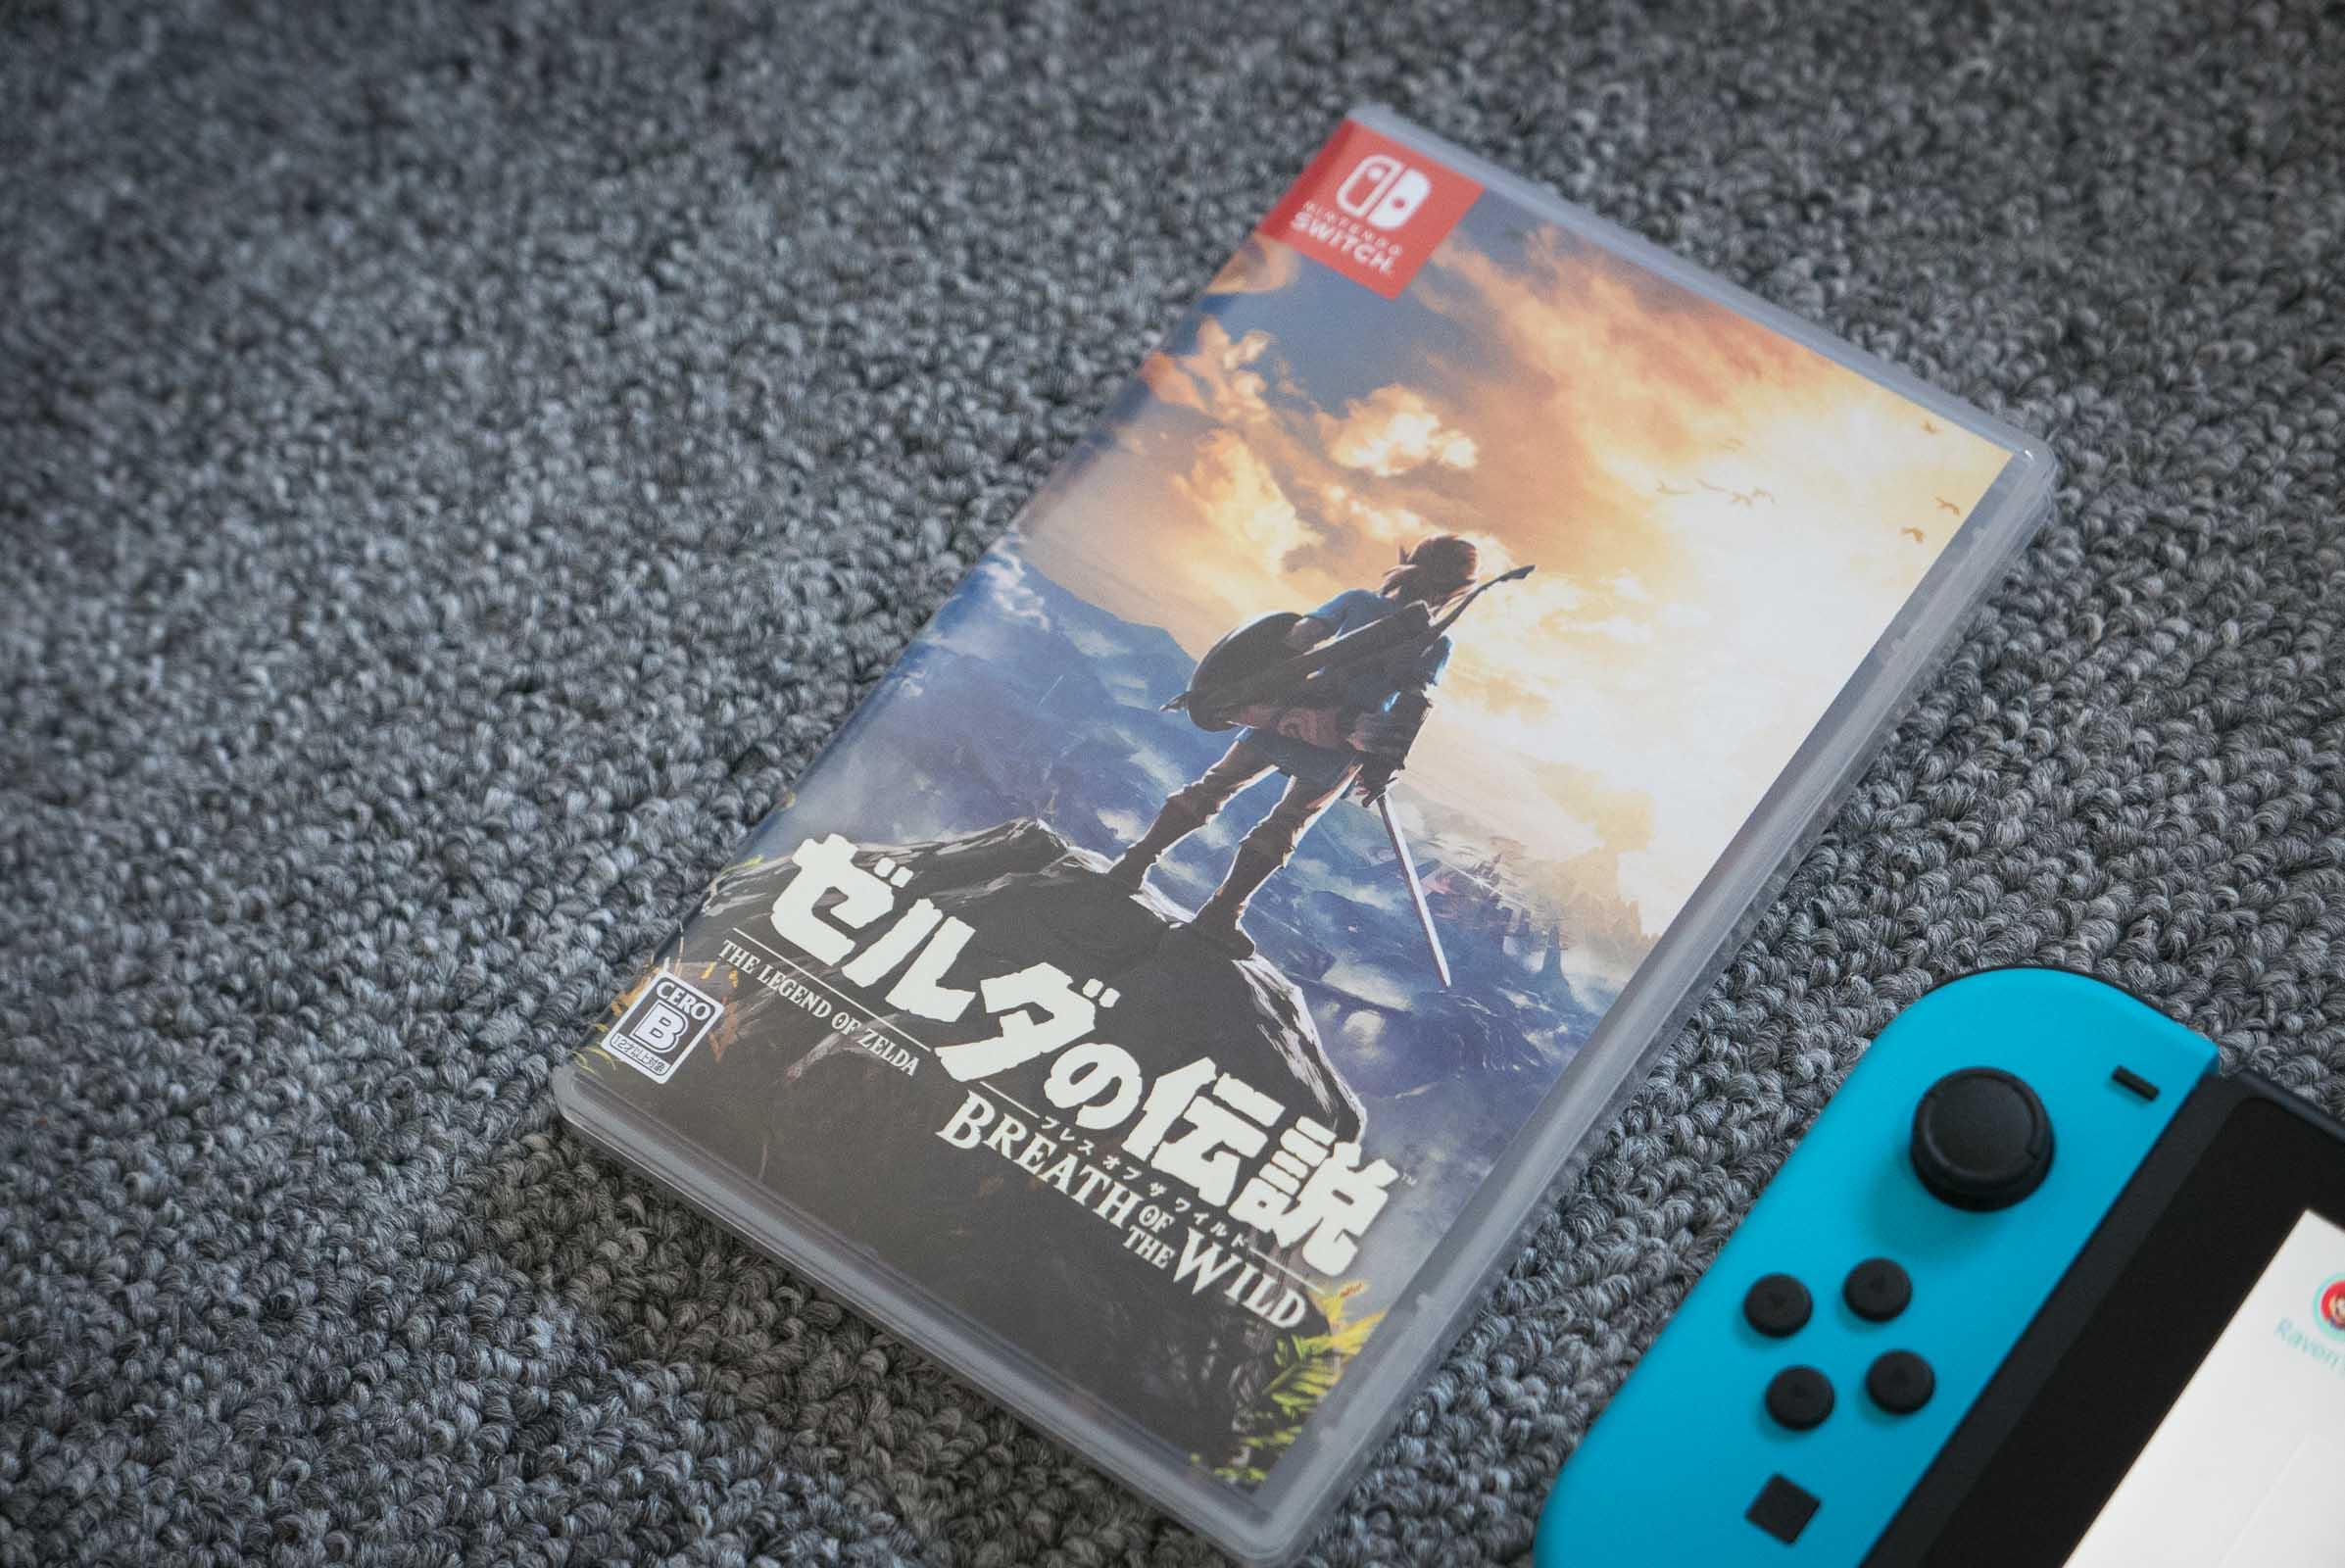 Nintendo Switch Photo By Hao Ying-7